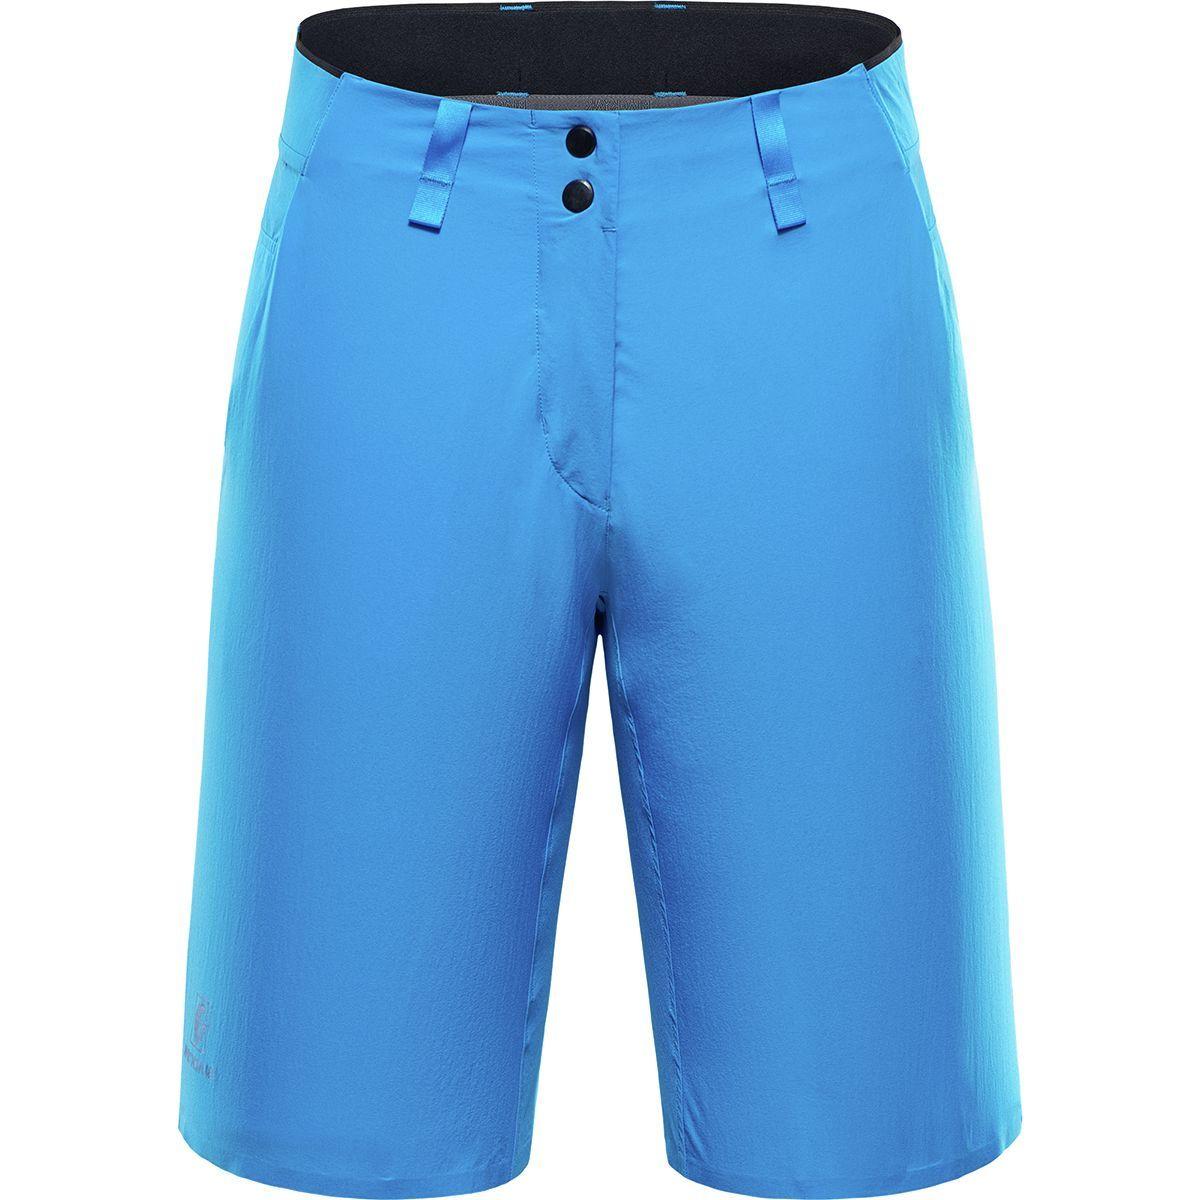 BLACKYAK Boran Short - Men's